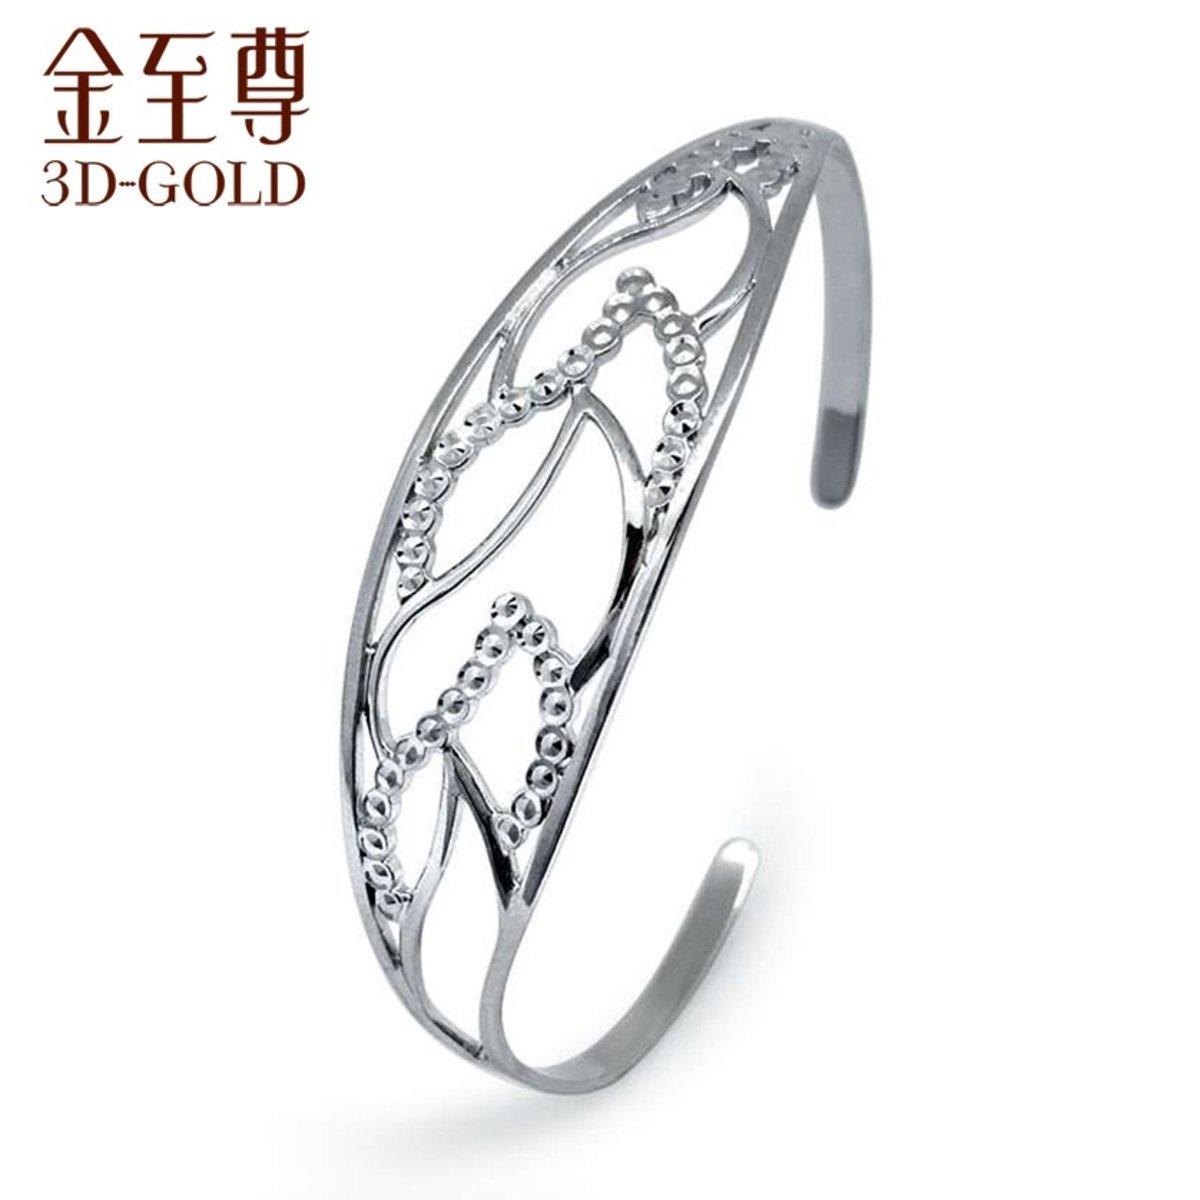 18K/750金(白色)手鐲